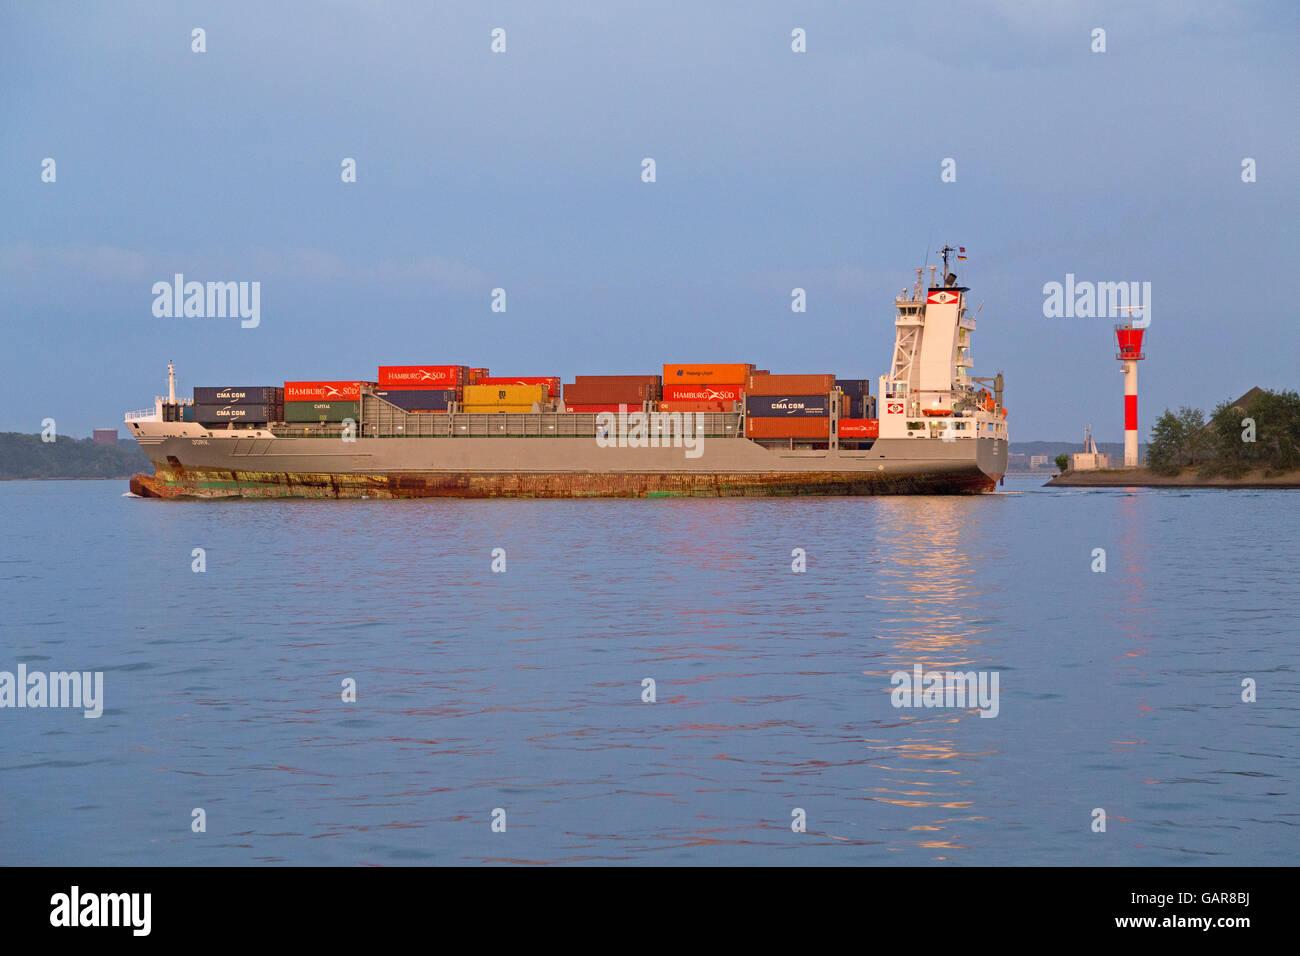 container ship ´Jork´, Kiel, Schleswig-Holstein, Germany - Stock Image